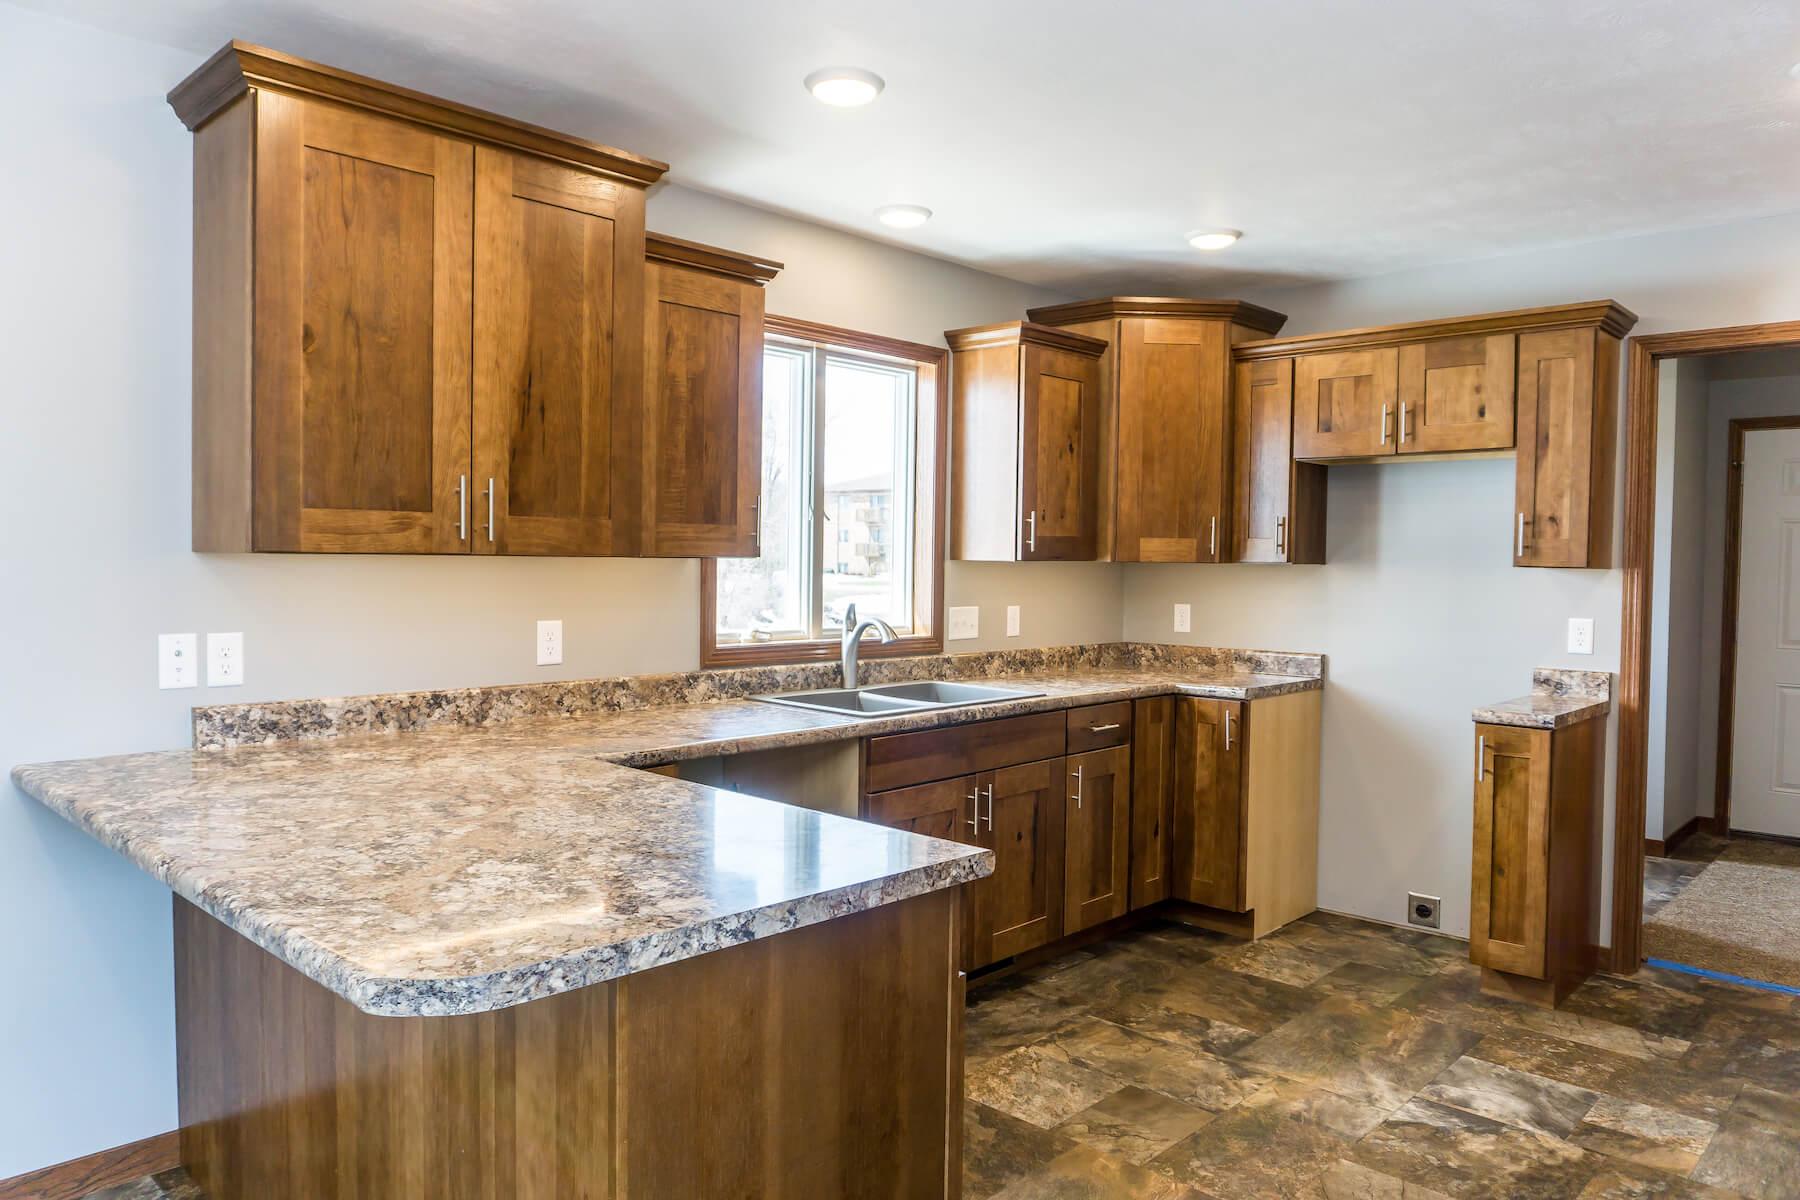 2019-4-12 Kemper Avenue Builders FirstSource Compressed  14.jpg